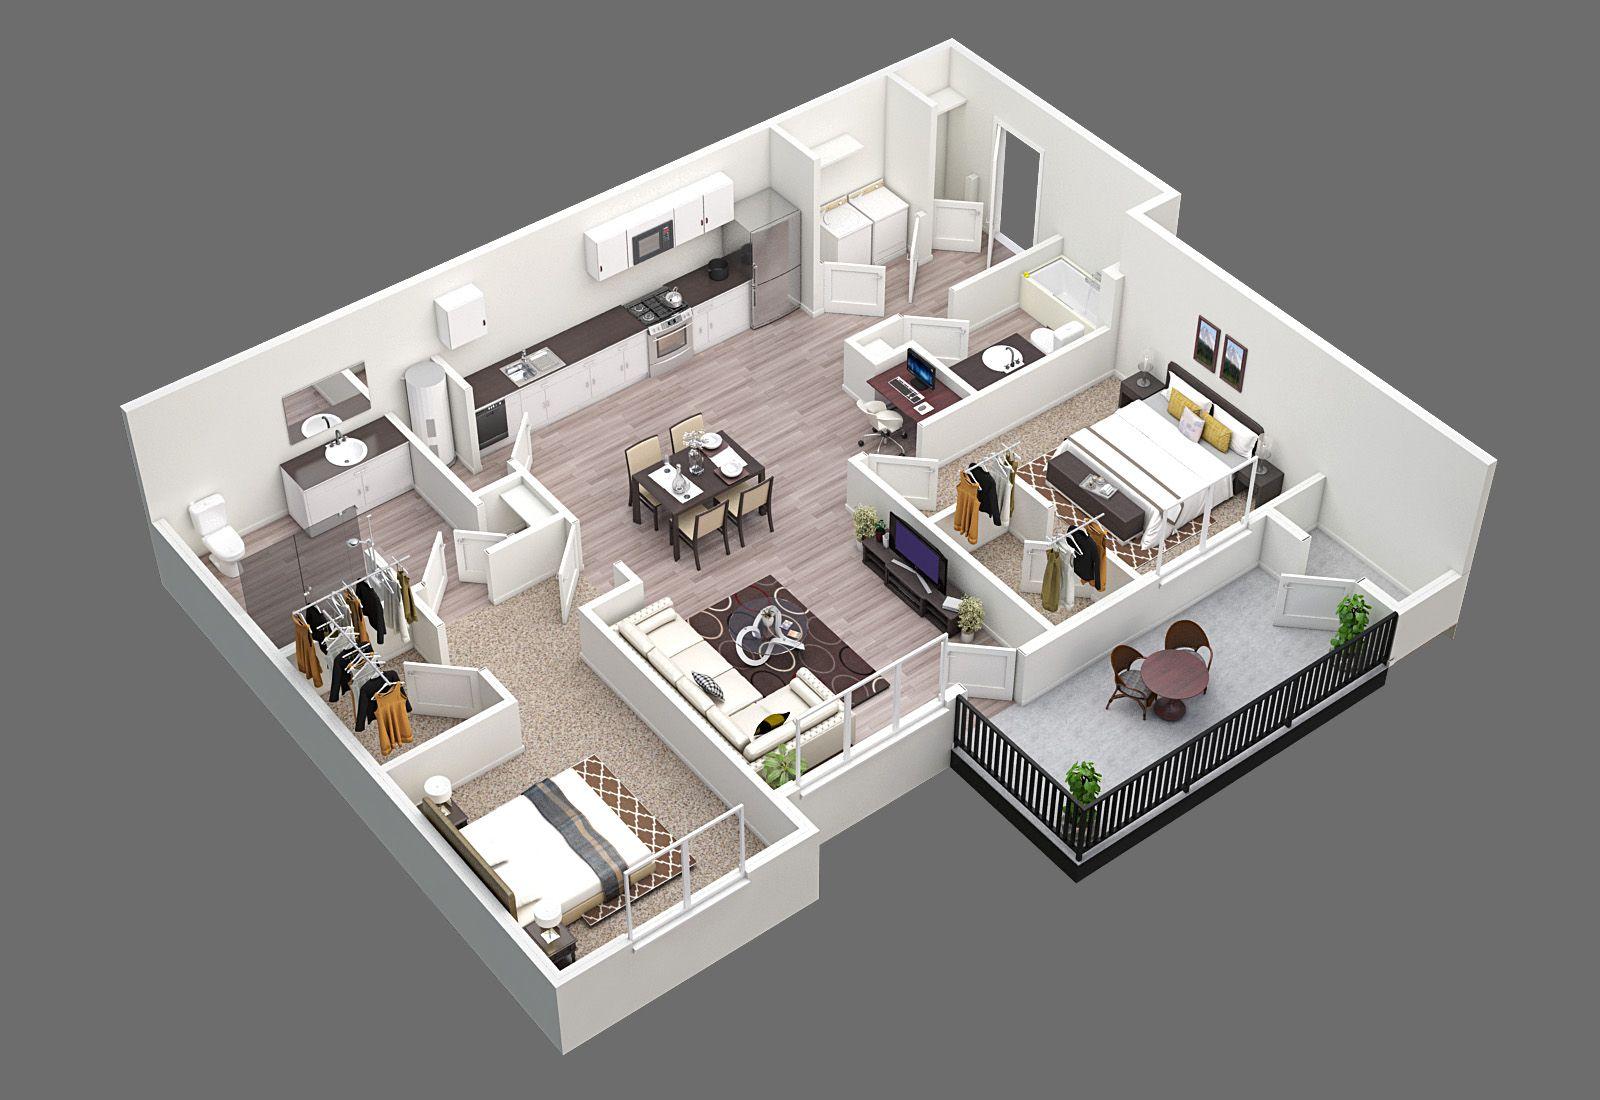 2 Bed 2 Bath 1103sf House Floor Design Sims House Design House Layout Plans